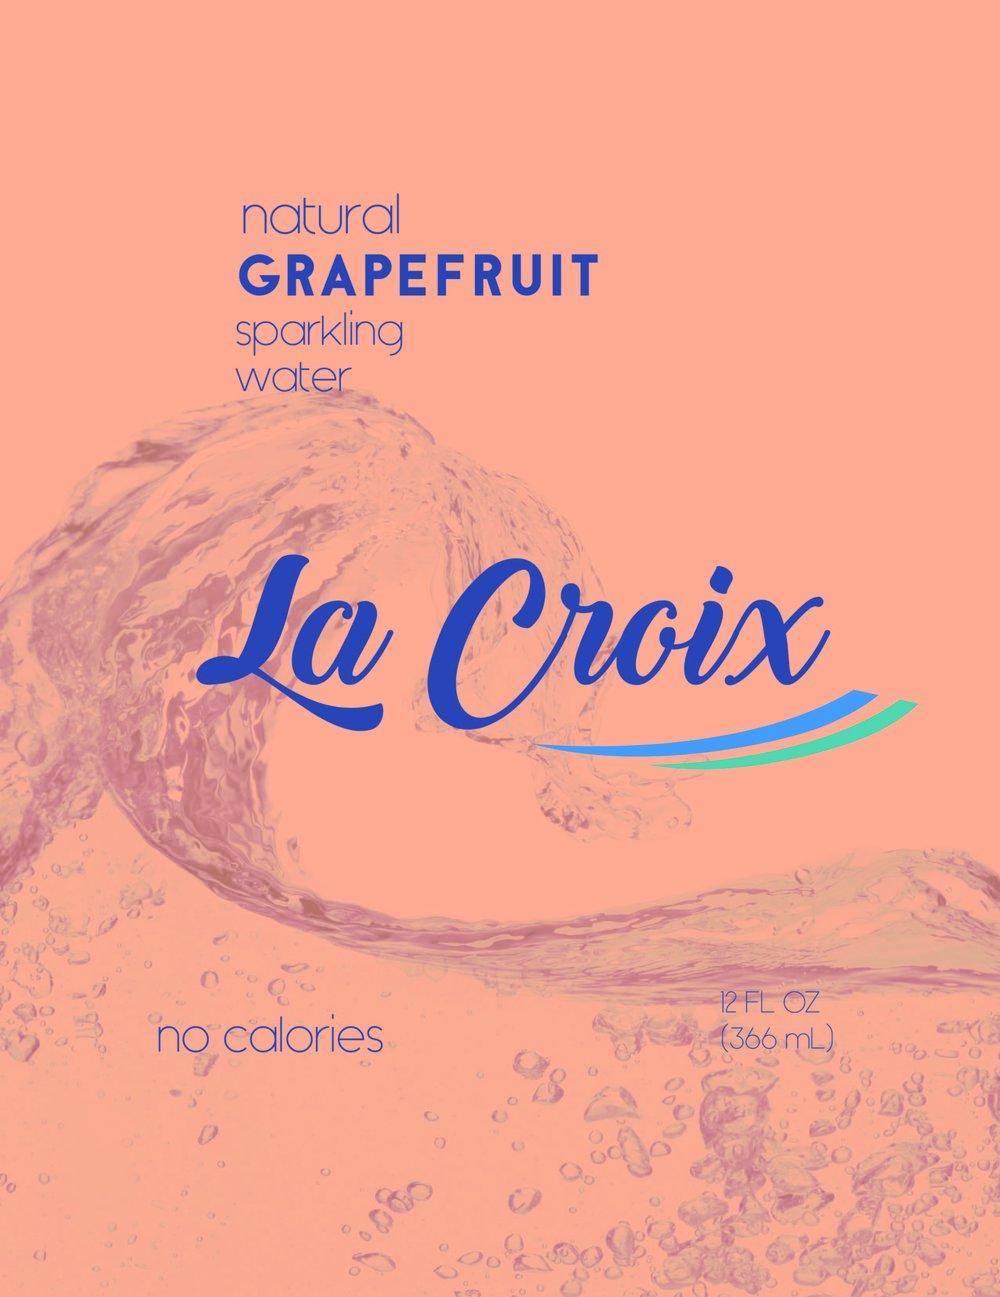 la croix grapefruit-01.jpg